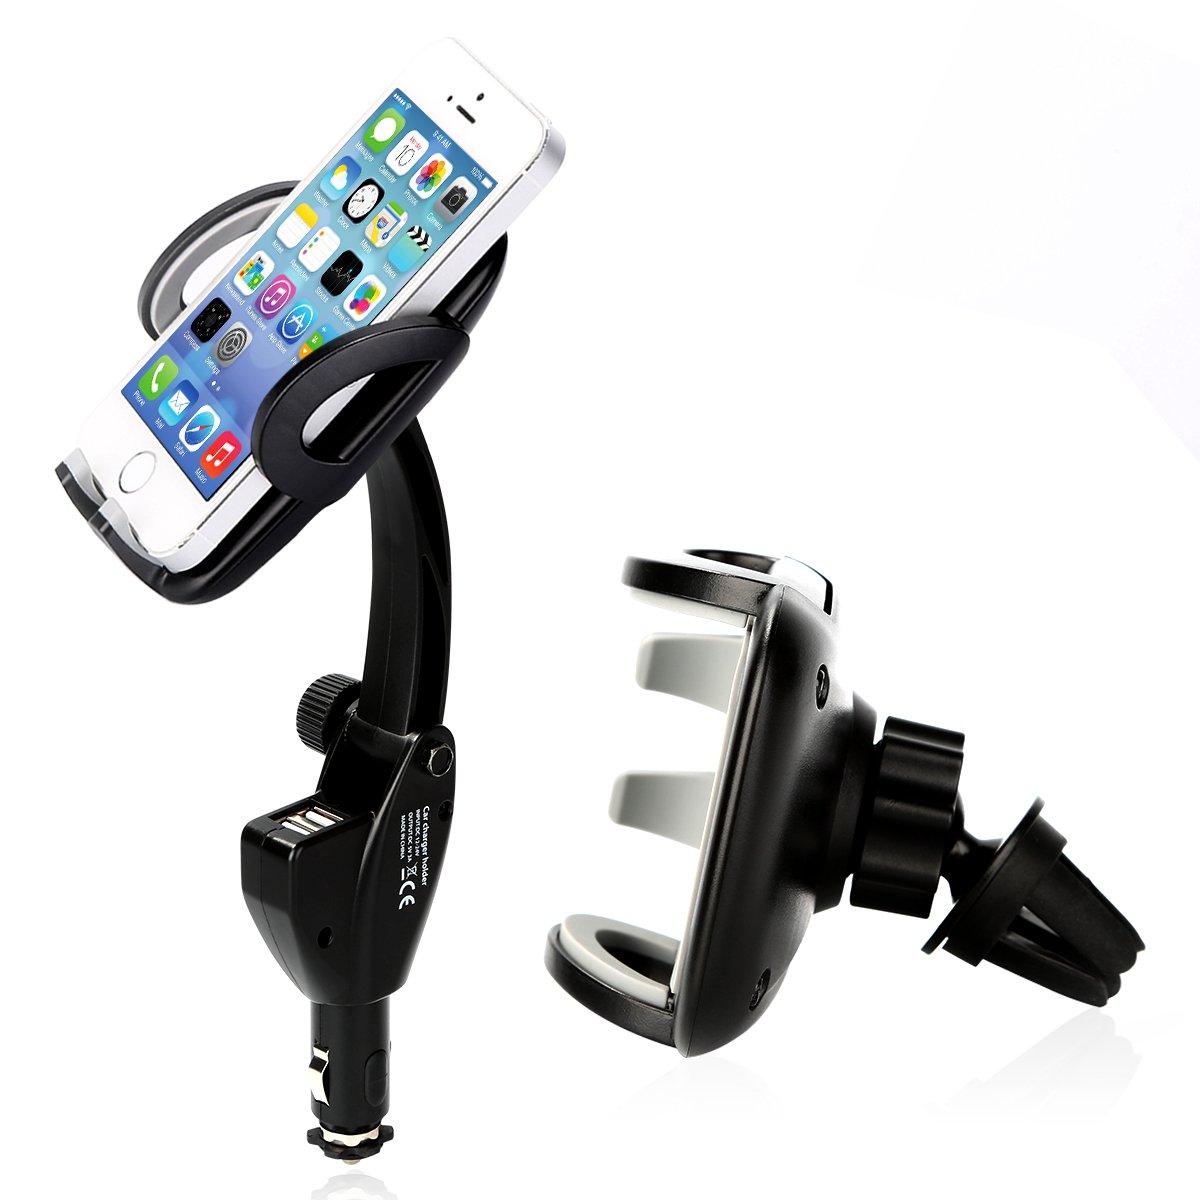 Car phone holder beschoi dual usb charging ports 360 degree swivel car mount for air vent cigarette lighter universal cradle for all smart phones mount